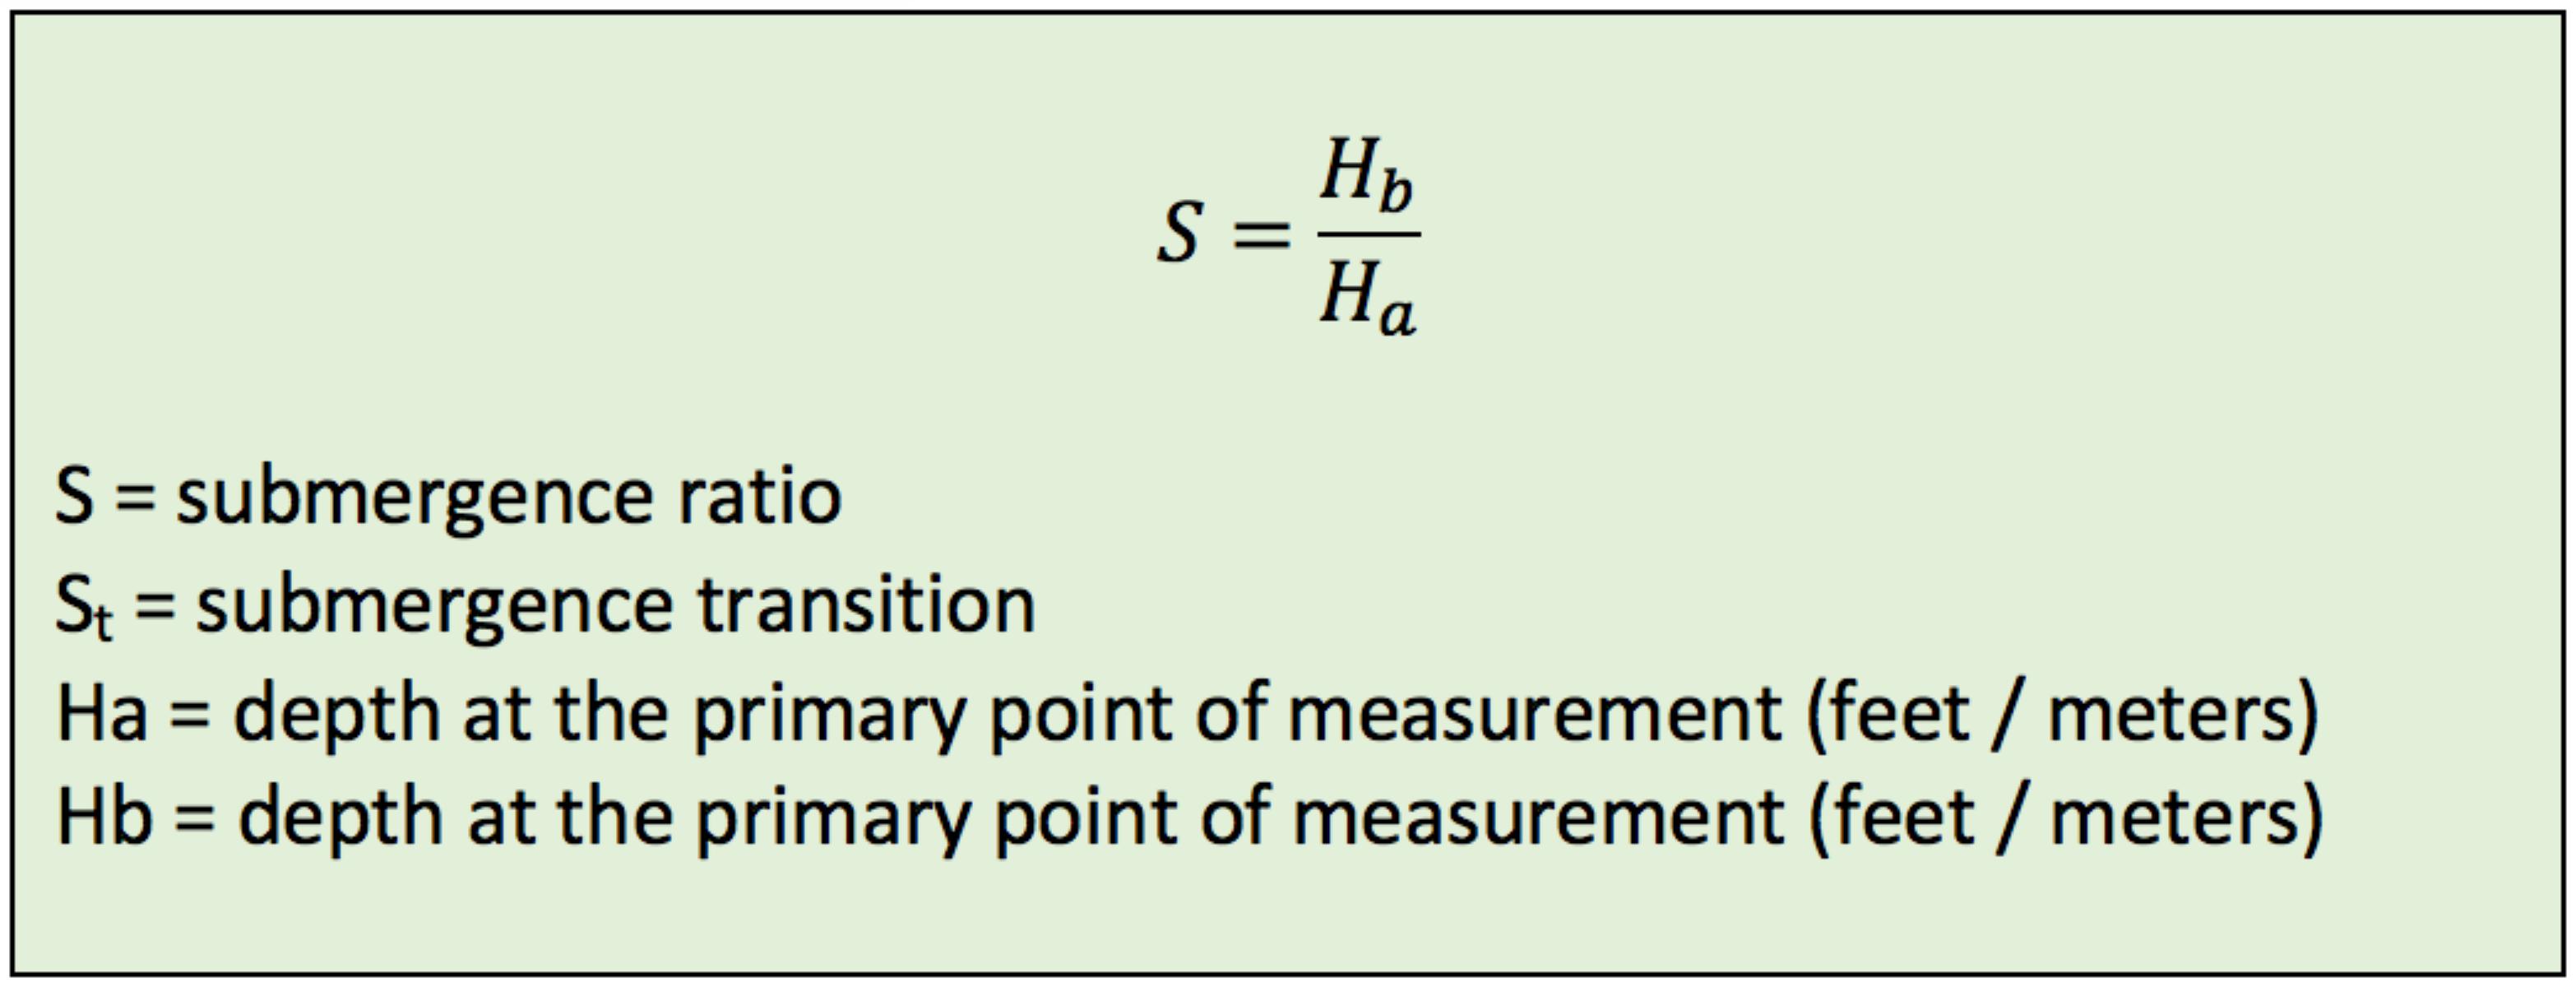 submegence-ratio-equation